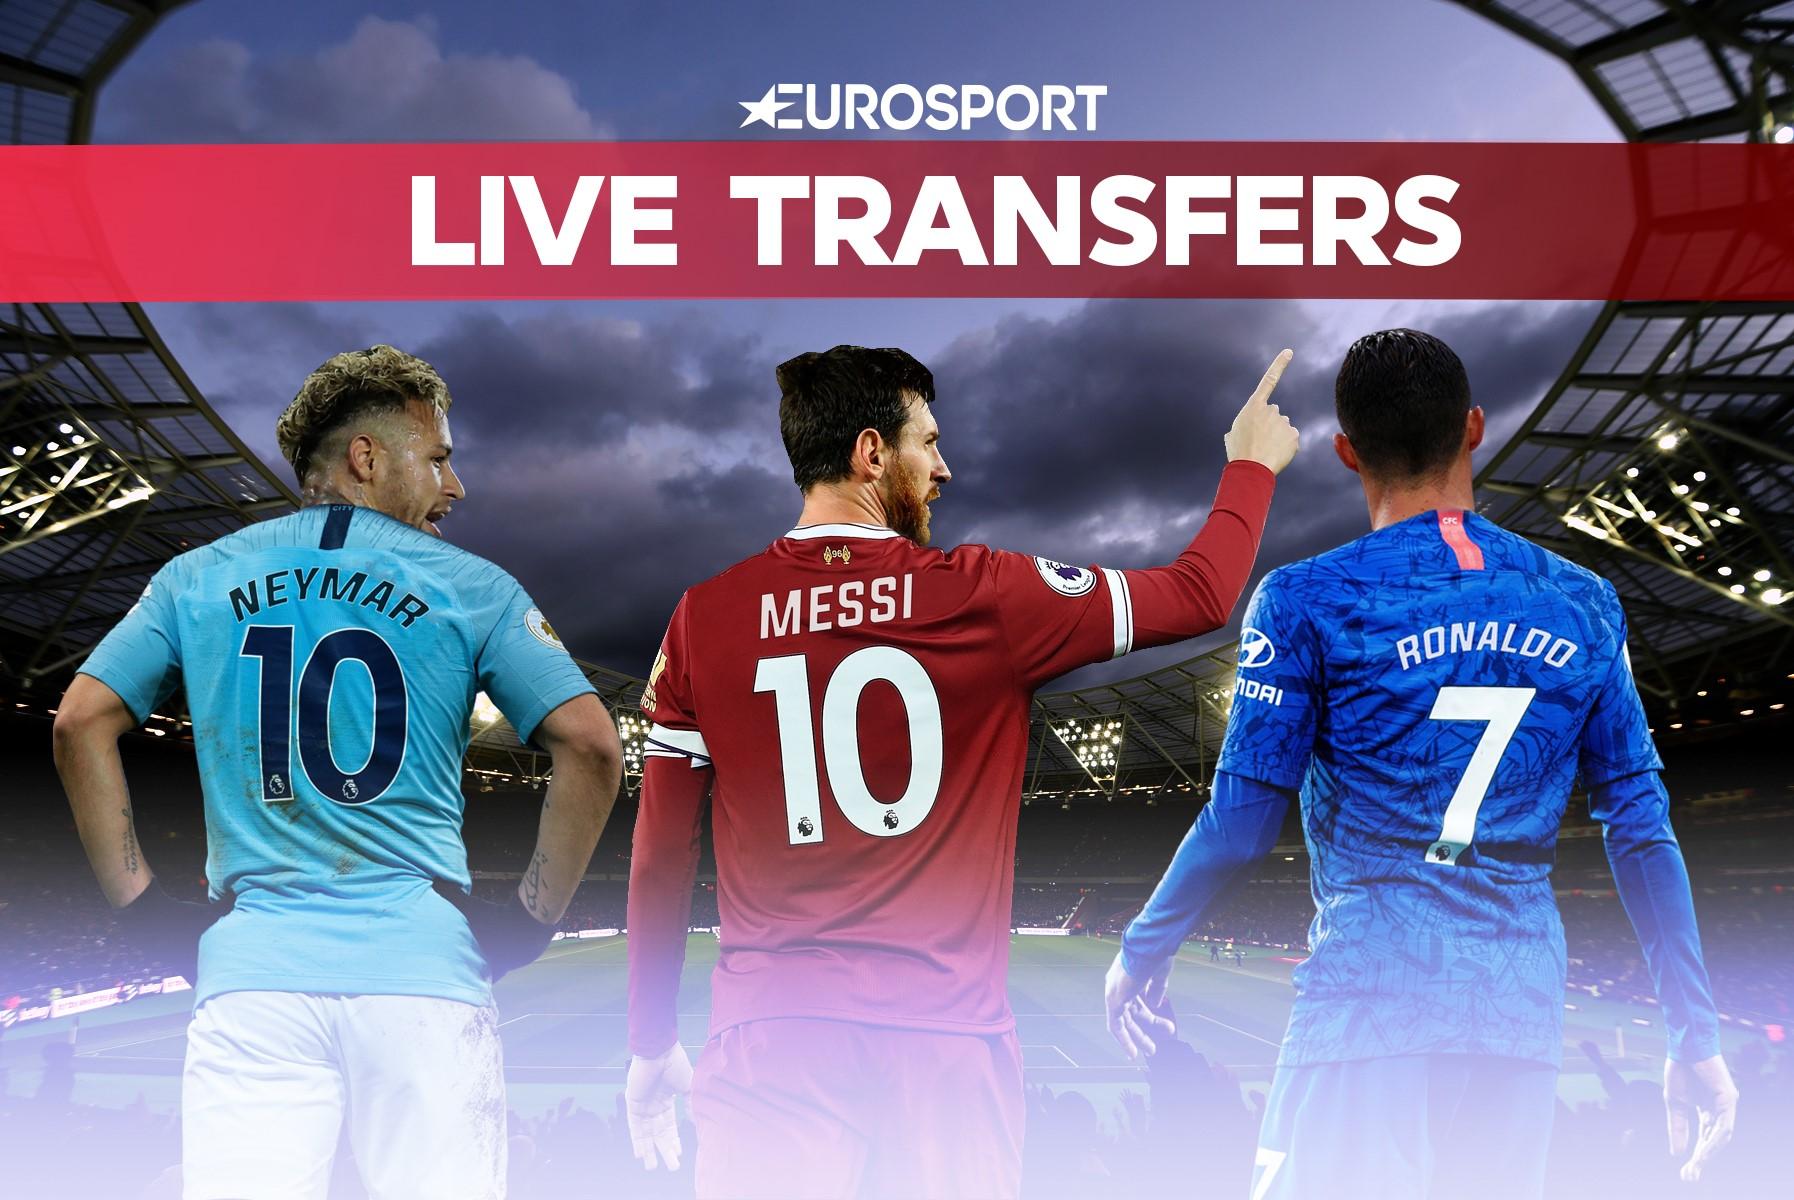 https://i.eurosport.com/2020/01/07/2748208.jpg